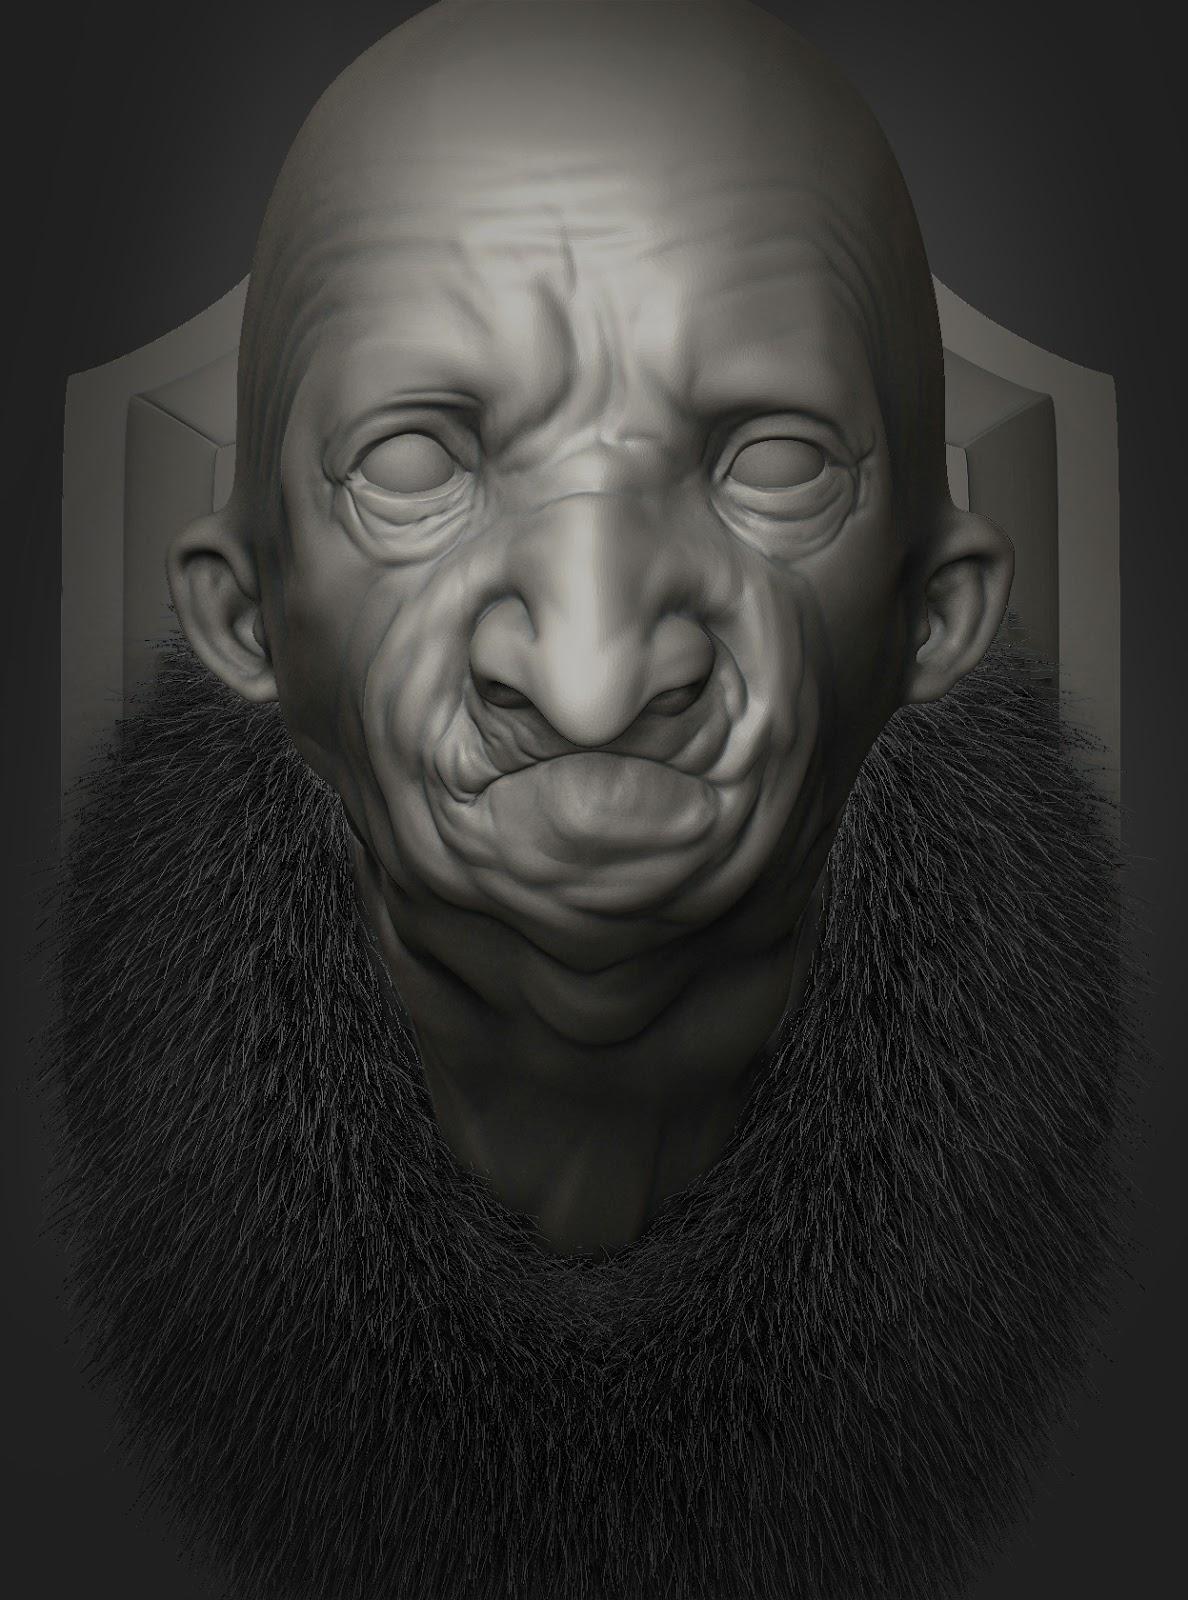 vulture+man+head.jpg